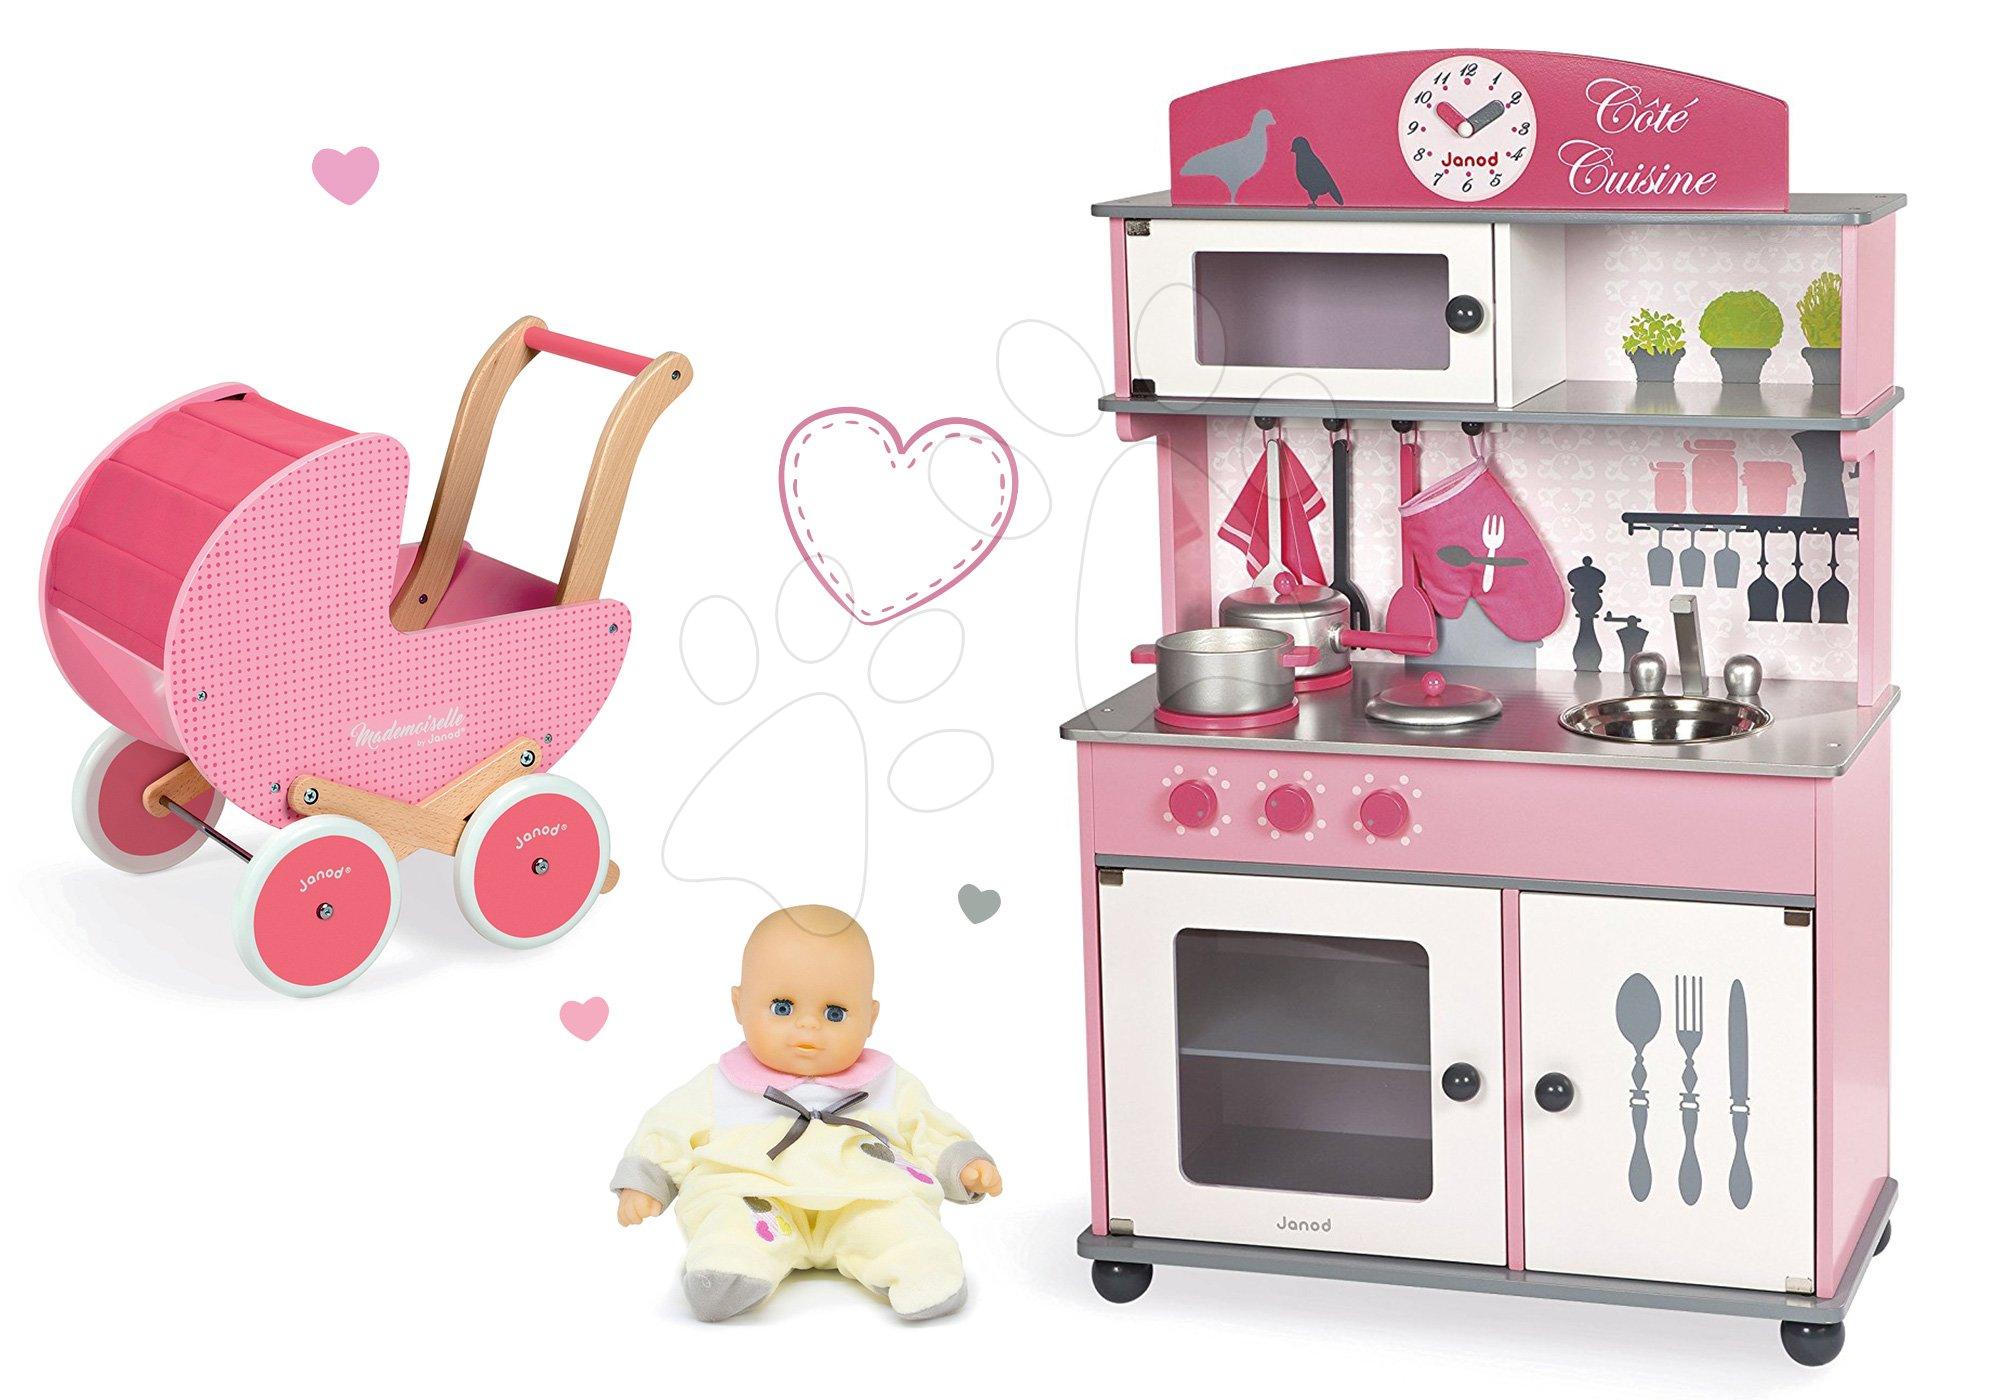 Set drevená kuchynka Cote Janod ružová na kolieskach a kočík s bábikou